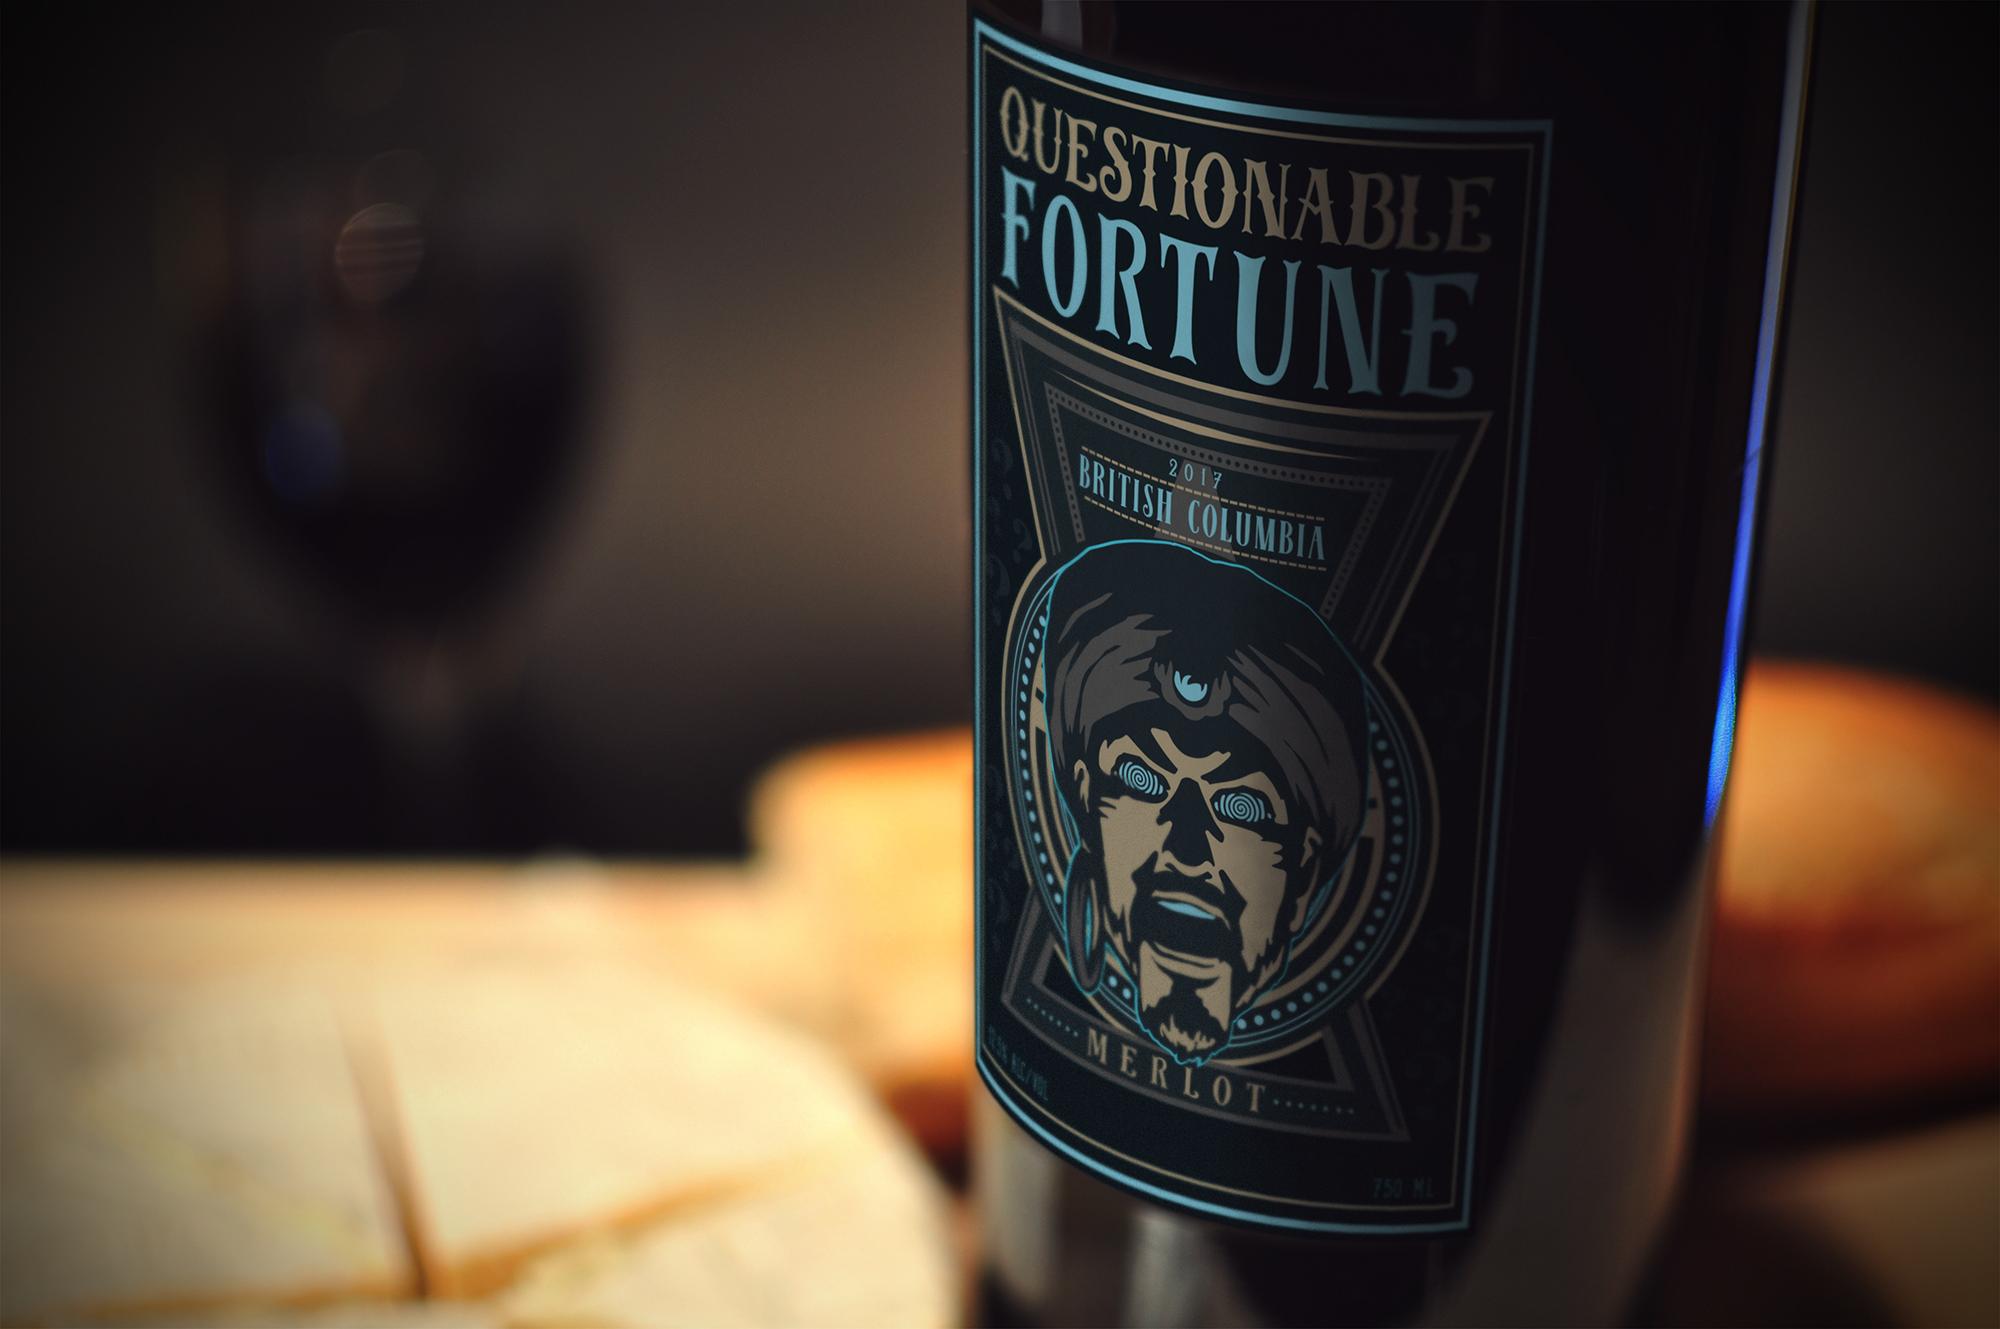 Label Design: Questionable Fortune Merlot